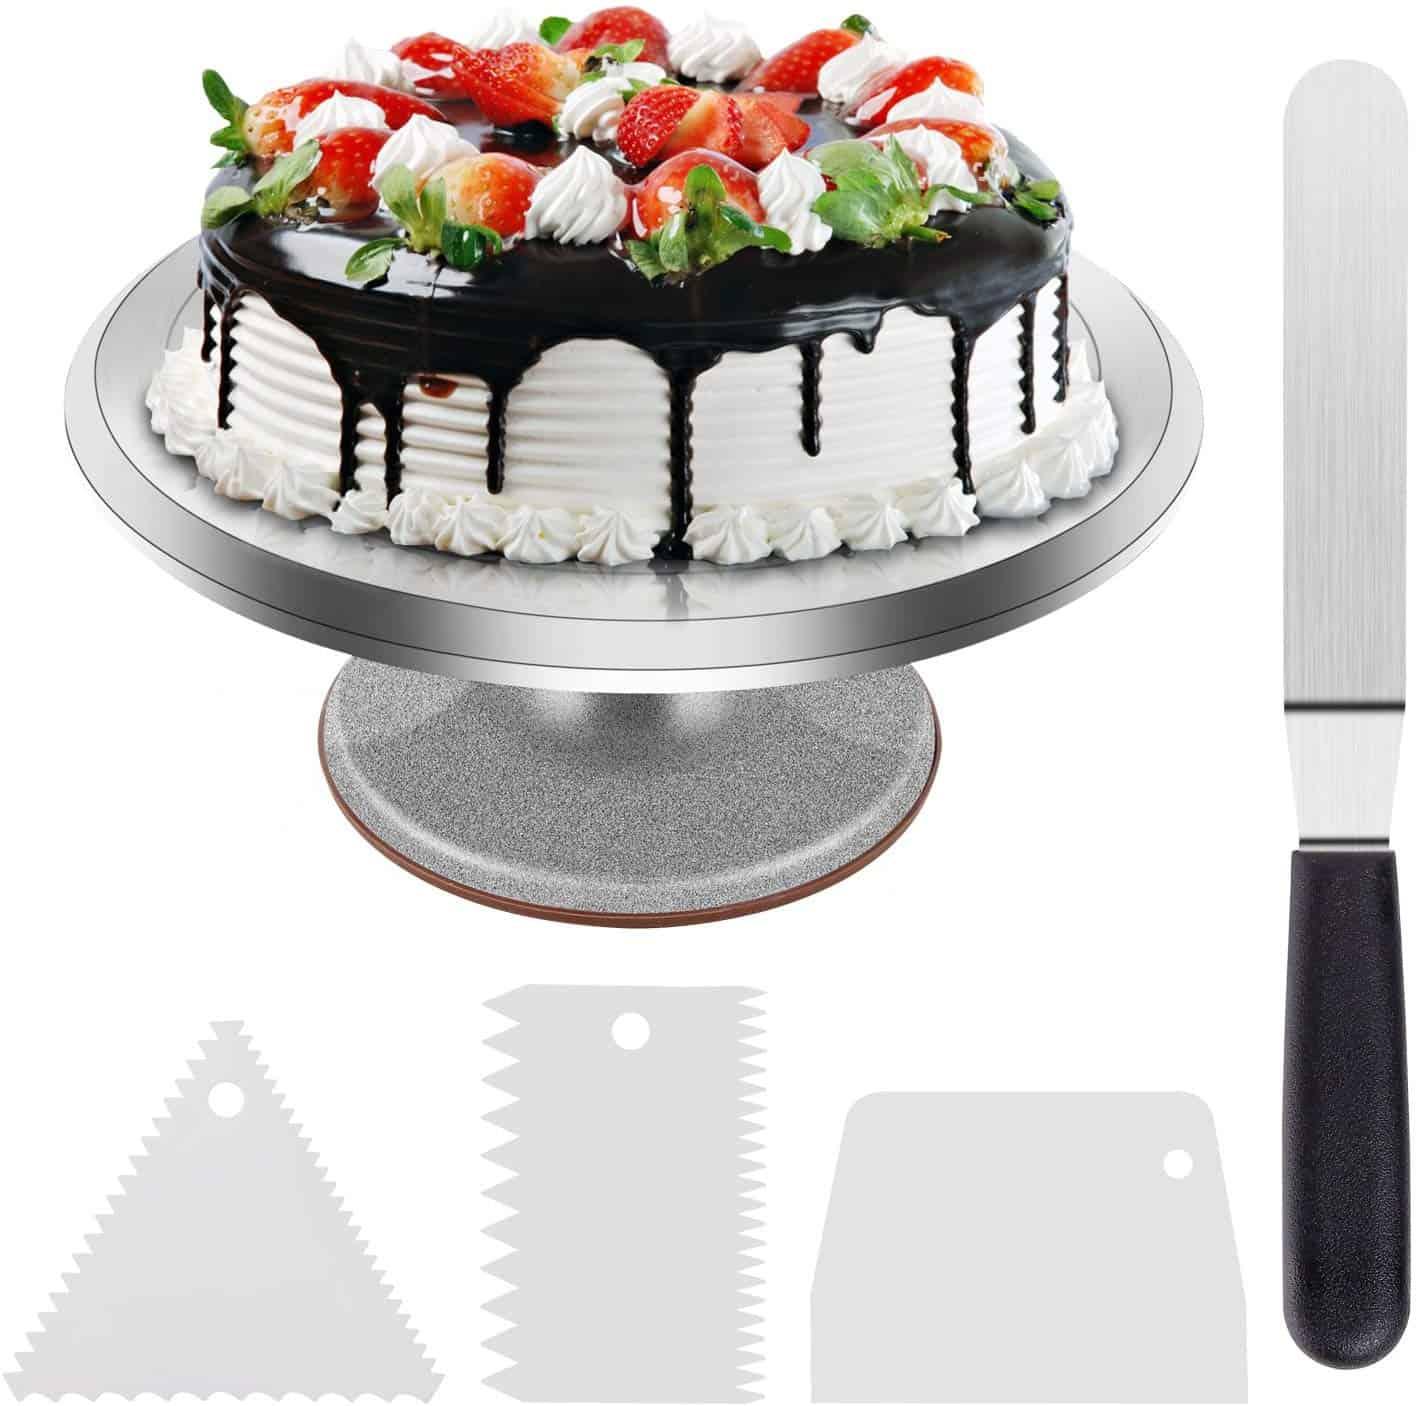 Ohuhu aluminum revolving cake stand